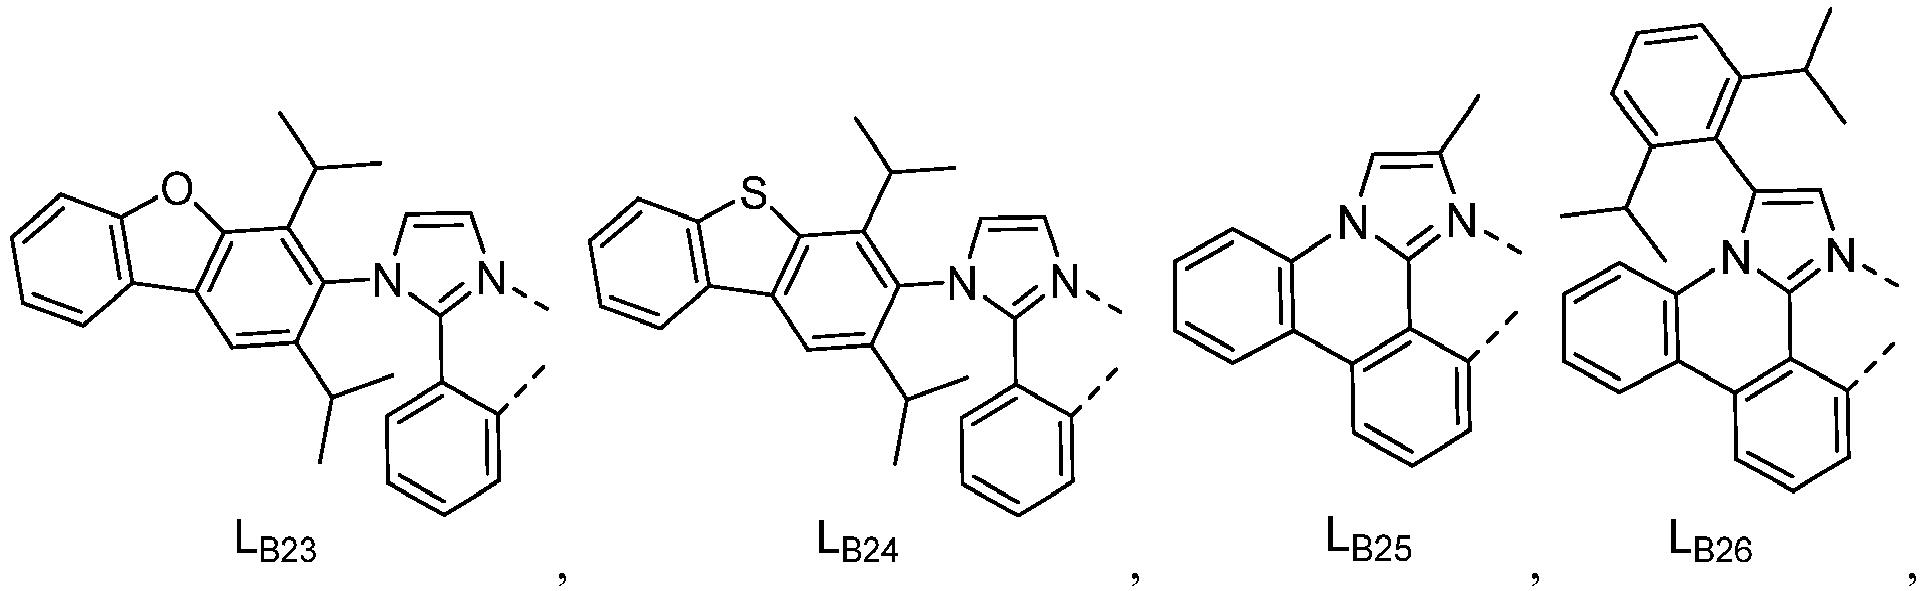 Figure imgb0812